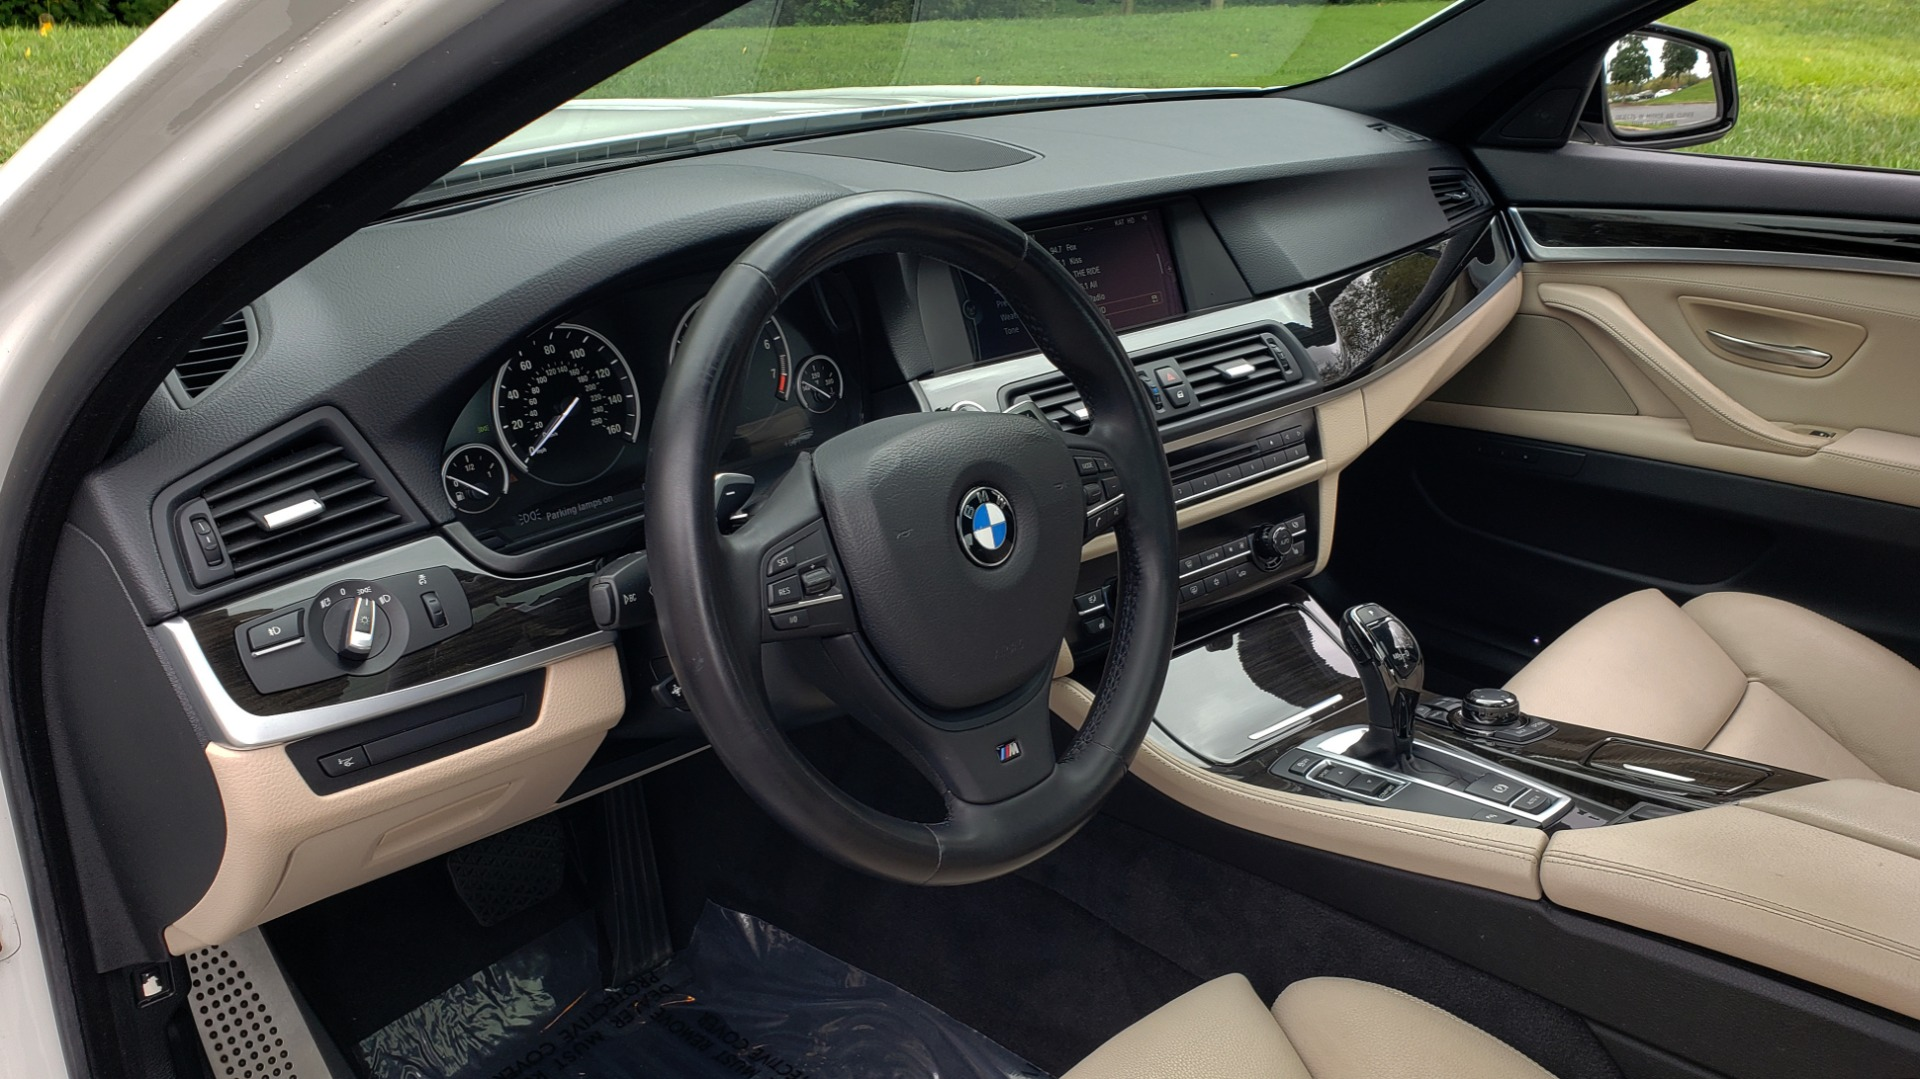 Used 2012 BMW 5 SERIES 550I M SPORT / NAV / CONV PKG / SUNROOF / PREM SND / REARVIEW for sale Sold at Formula Imports in Charlotte NC 28227 31